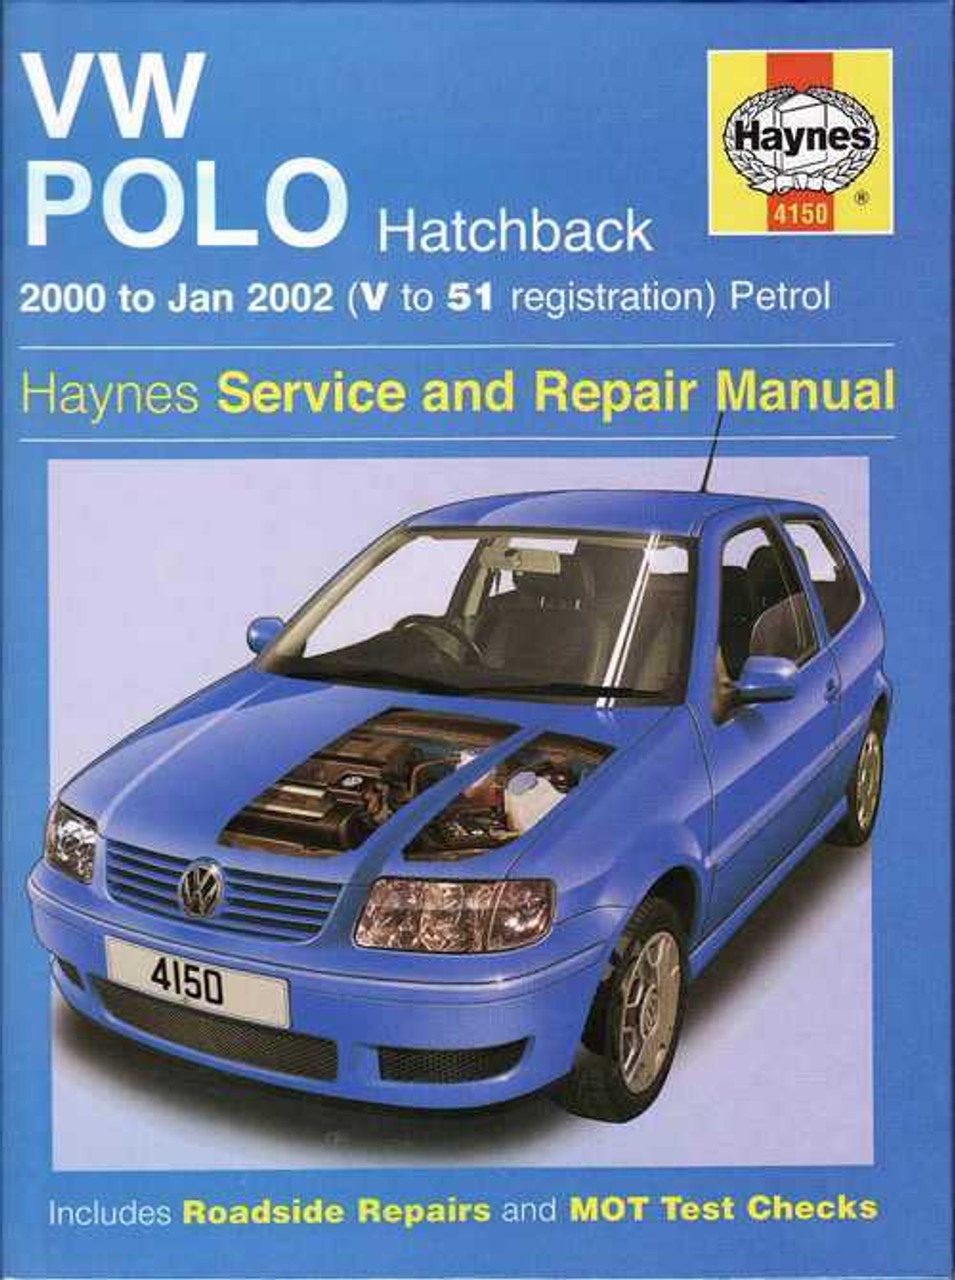 volkswagen polo 2000 2002 workshop manual rh automotobookshop com au vw polo petrol & diesel service & repair manual 2002 to 2005 volkswagen polo 2002 service manual